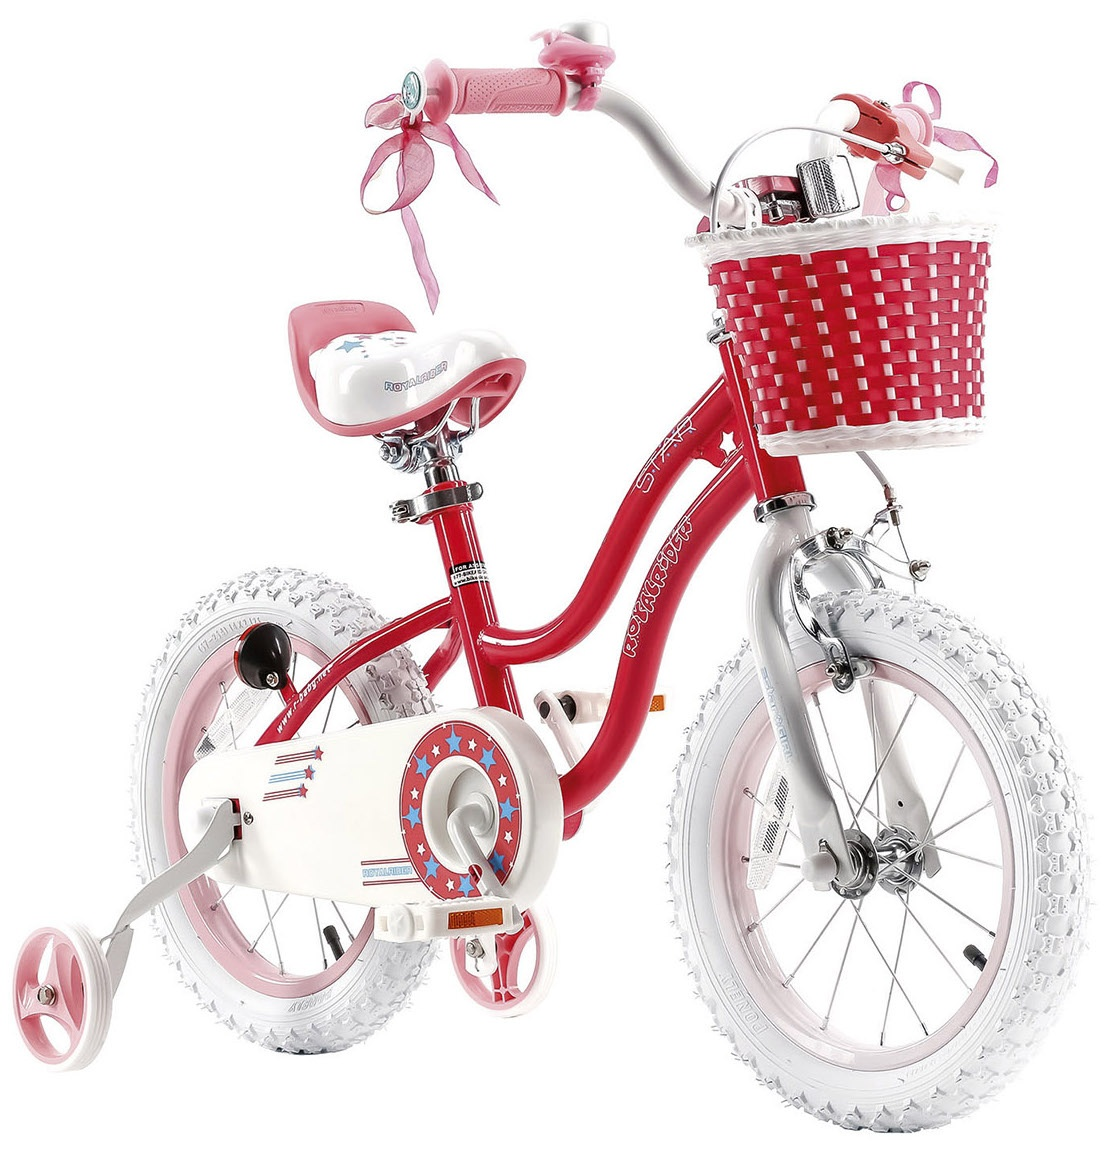 ad077344863 RoyalBaby Stargirl 16 Inch Girls Drum brake Red/Pink - Internet-Bikes